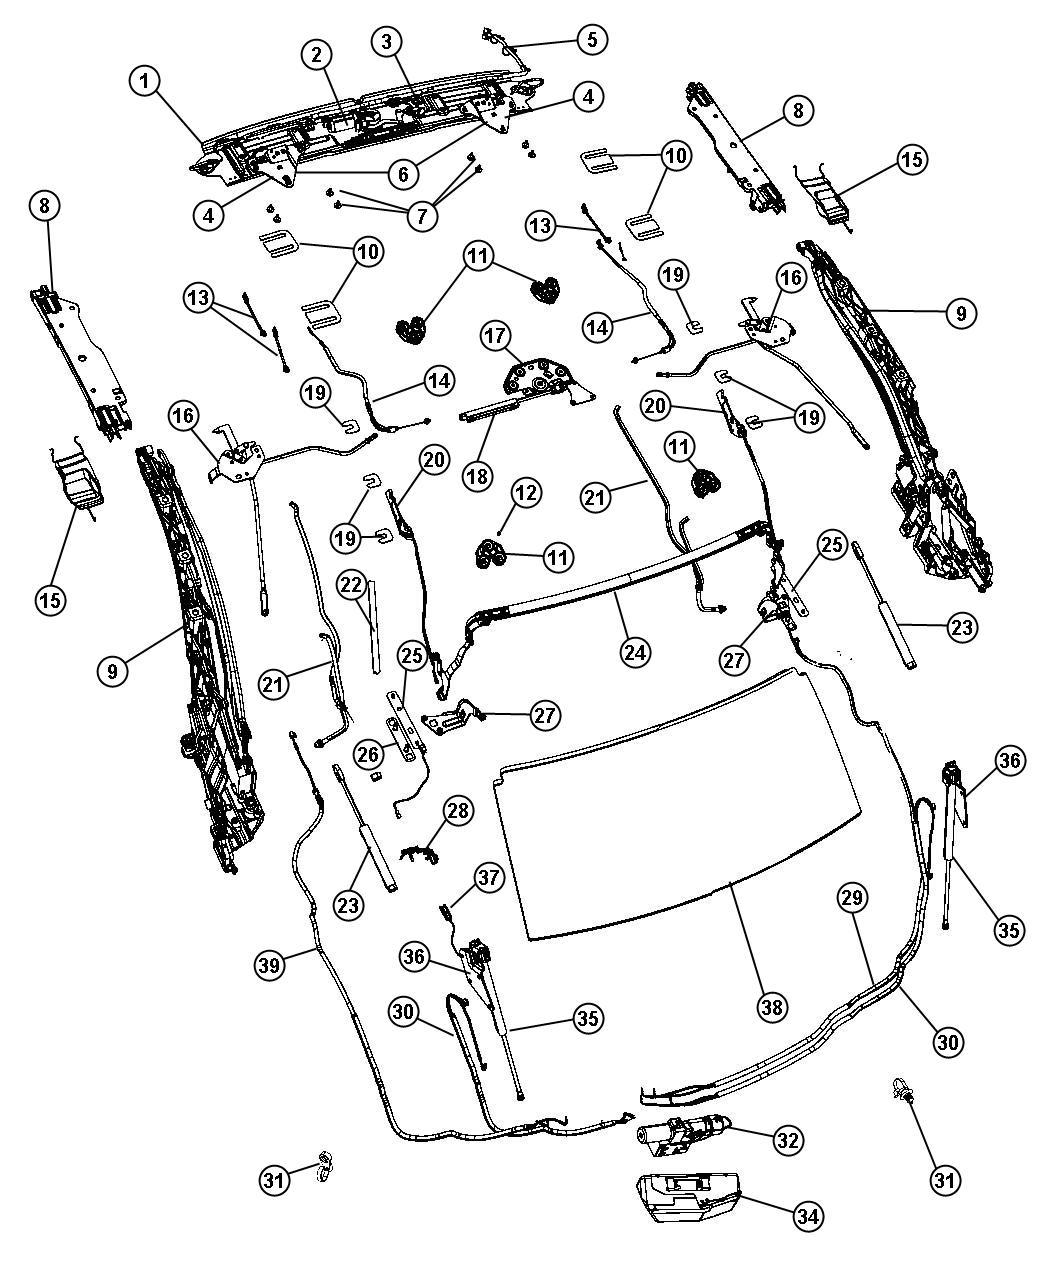 2004 grand prix turn signal wiring diagram